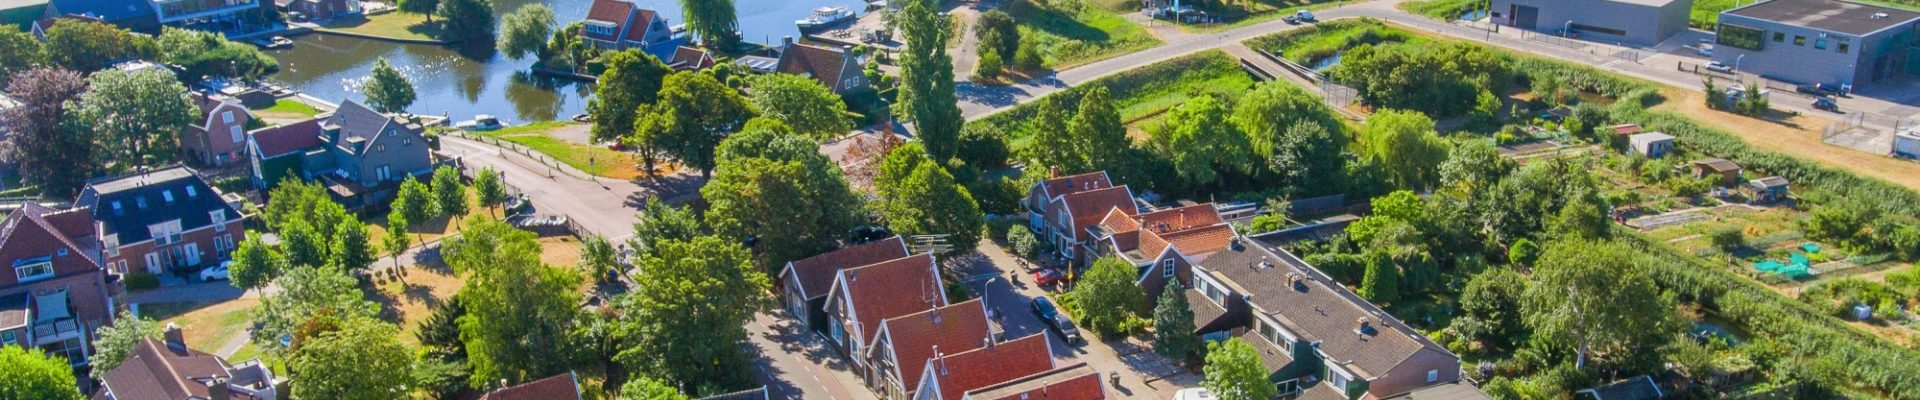 Kadaster Drone Fotografie 2